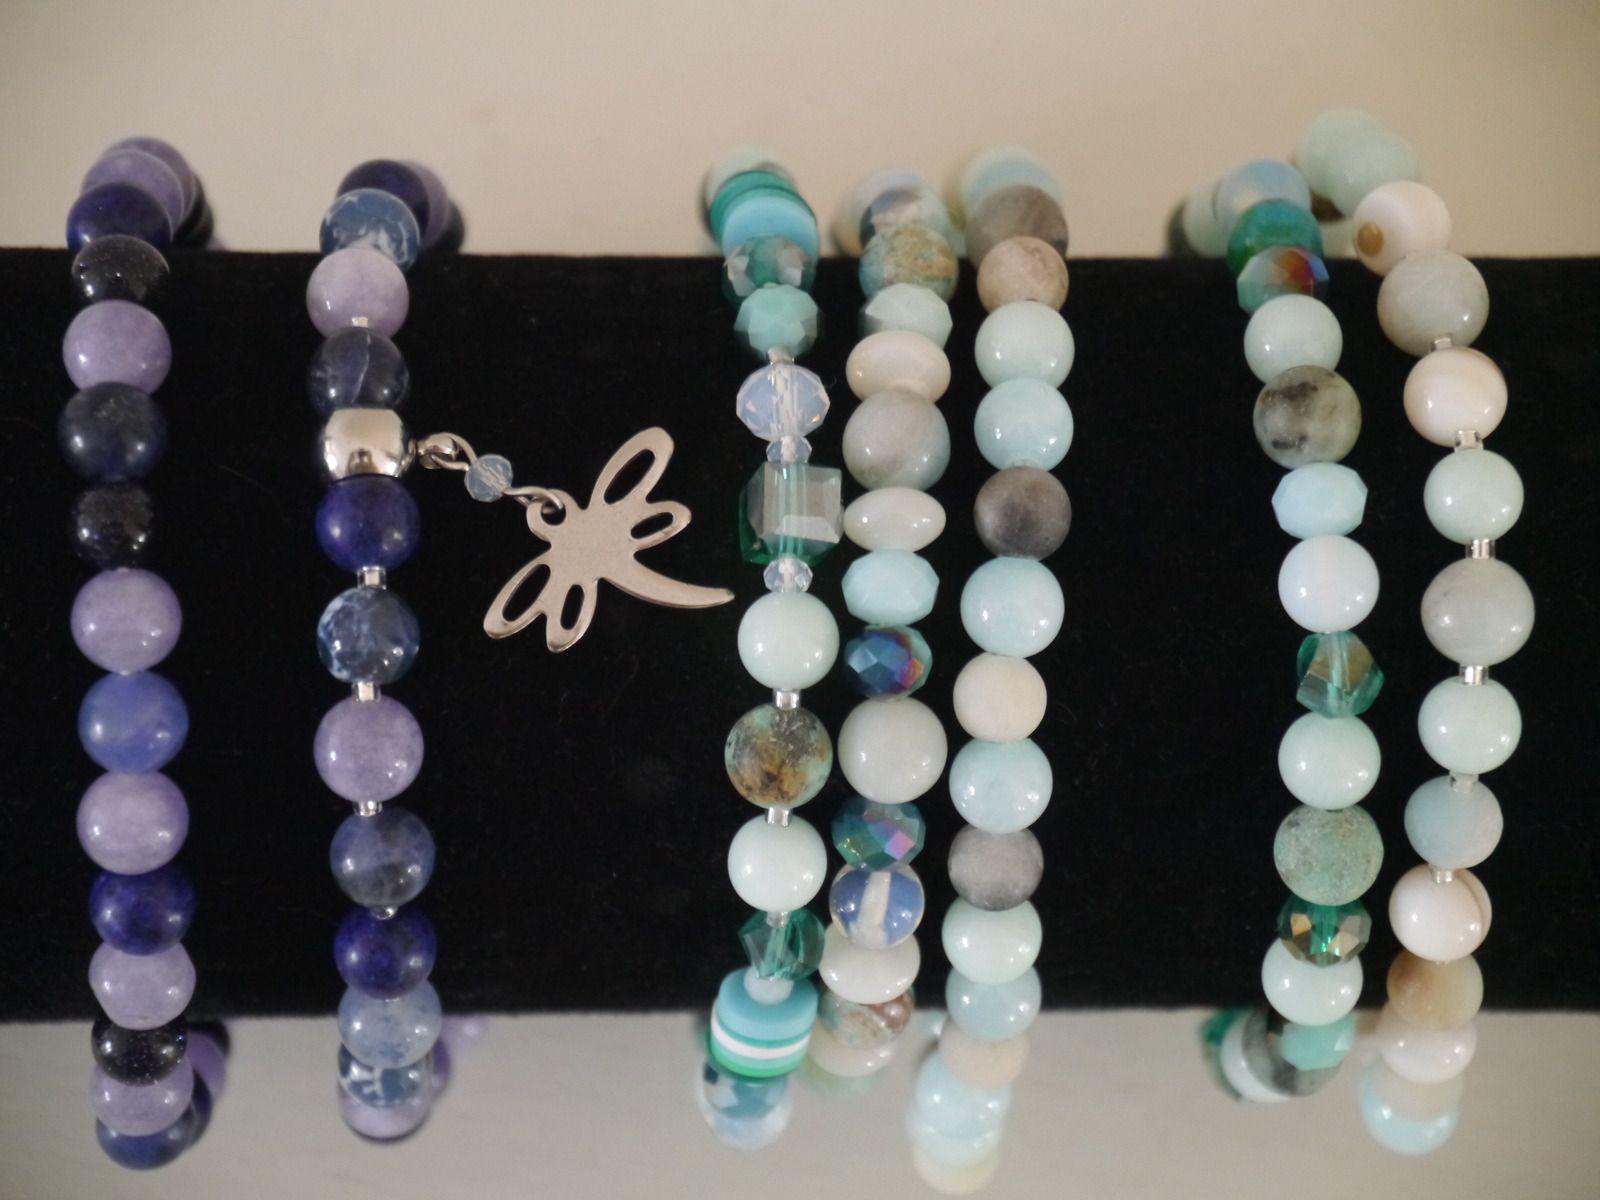 Amazonite, sodalite, lapis lazuli, angélite, etc